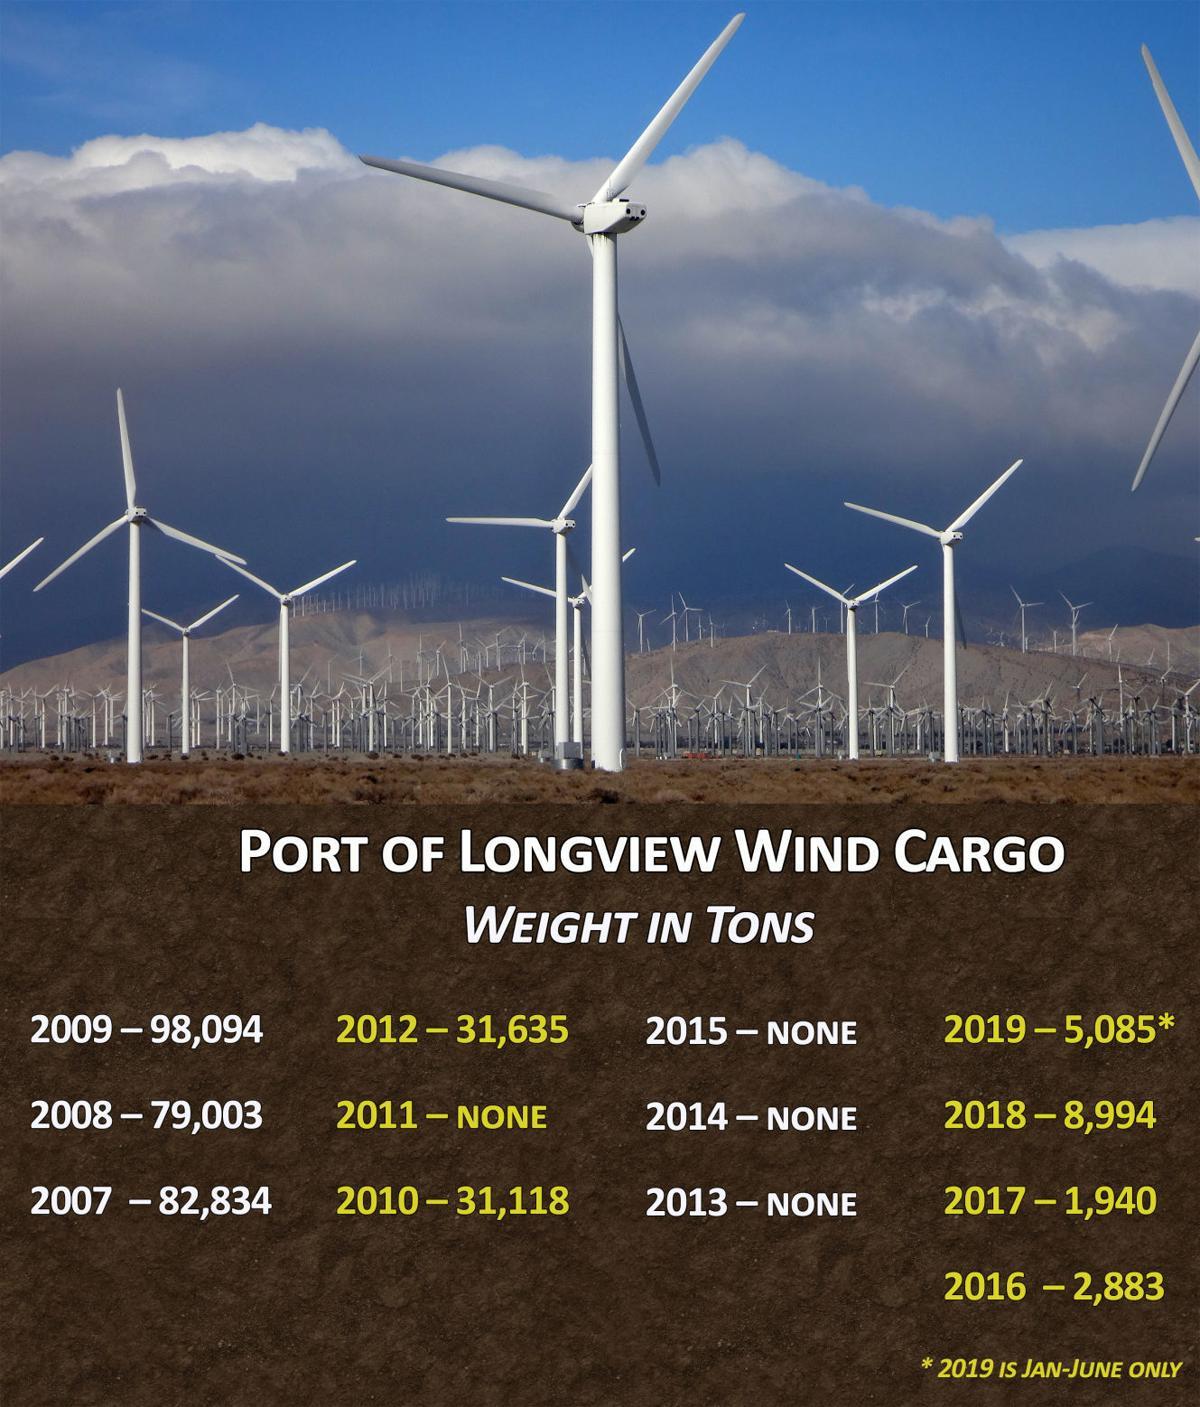 Port of Longview Wind Cargo